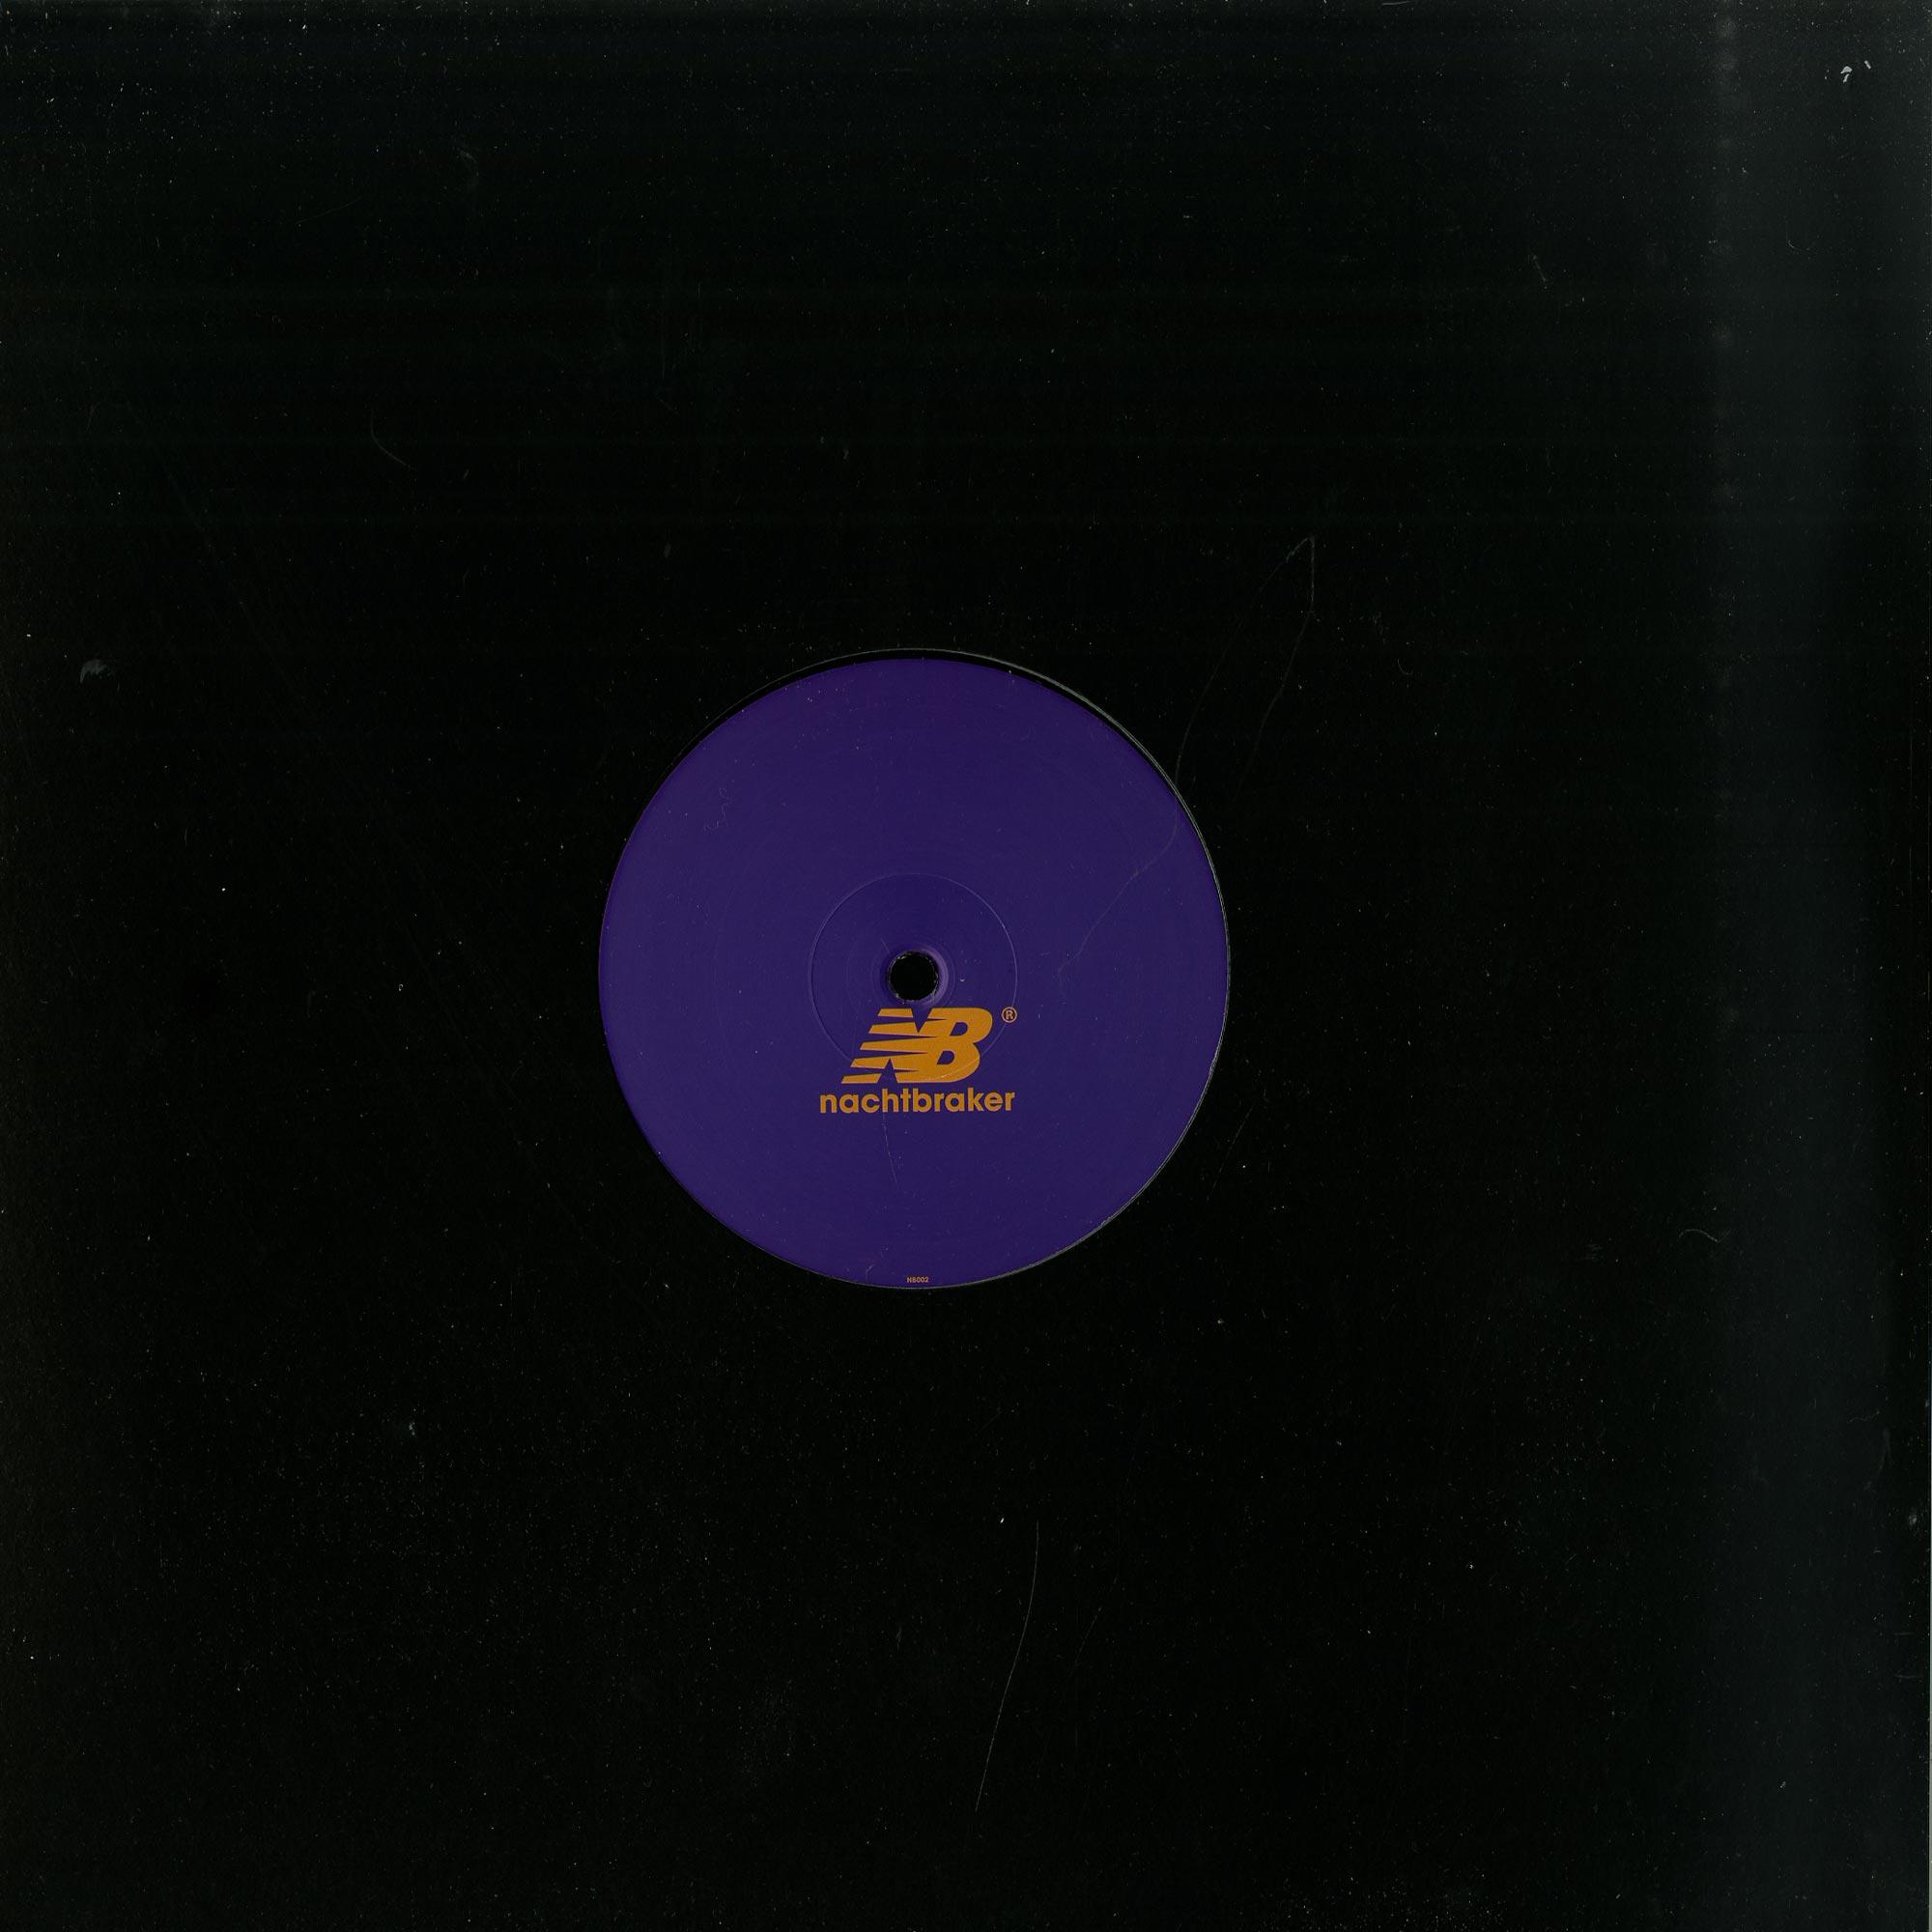 Nachtbraker - LEONARDO CEVICHE